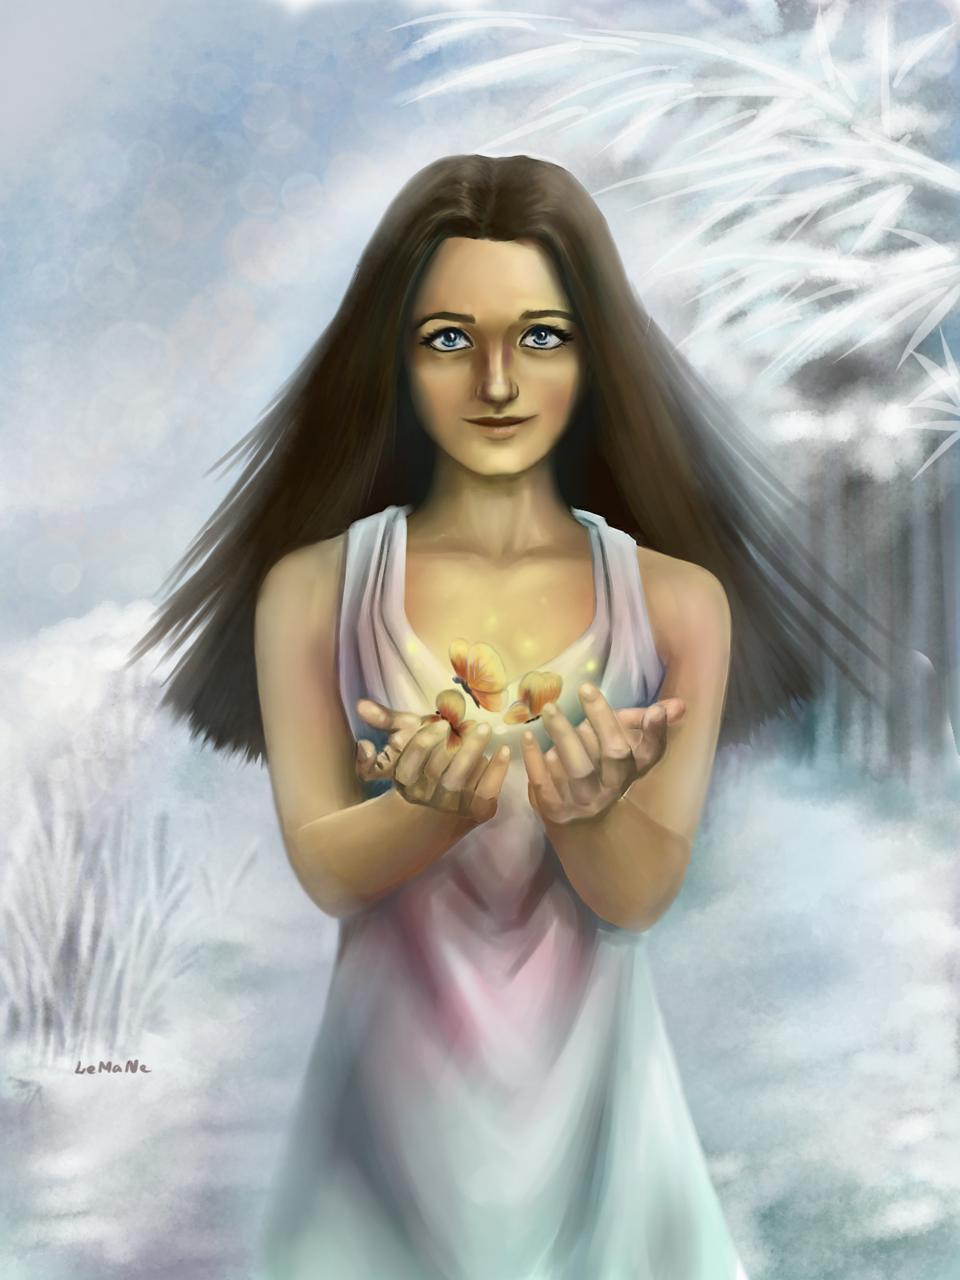 Б2 Illust of Lema-lisa medibangpaint winter fairytale butterfly spring